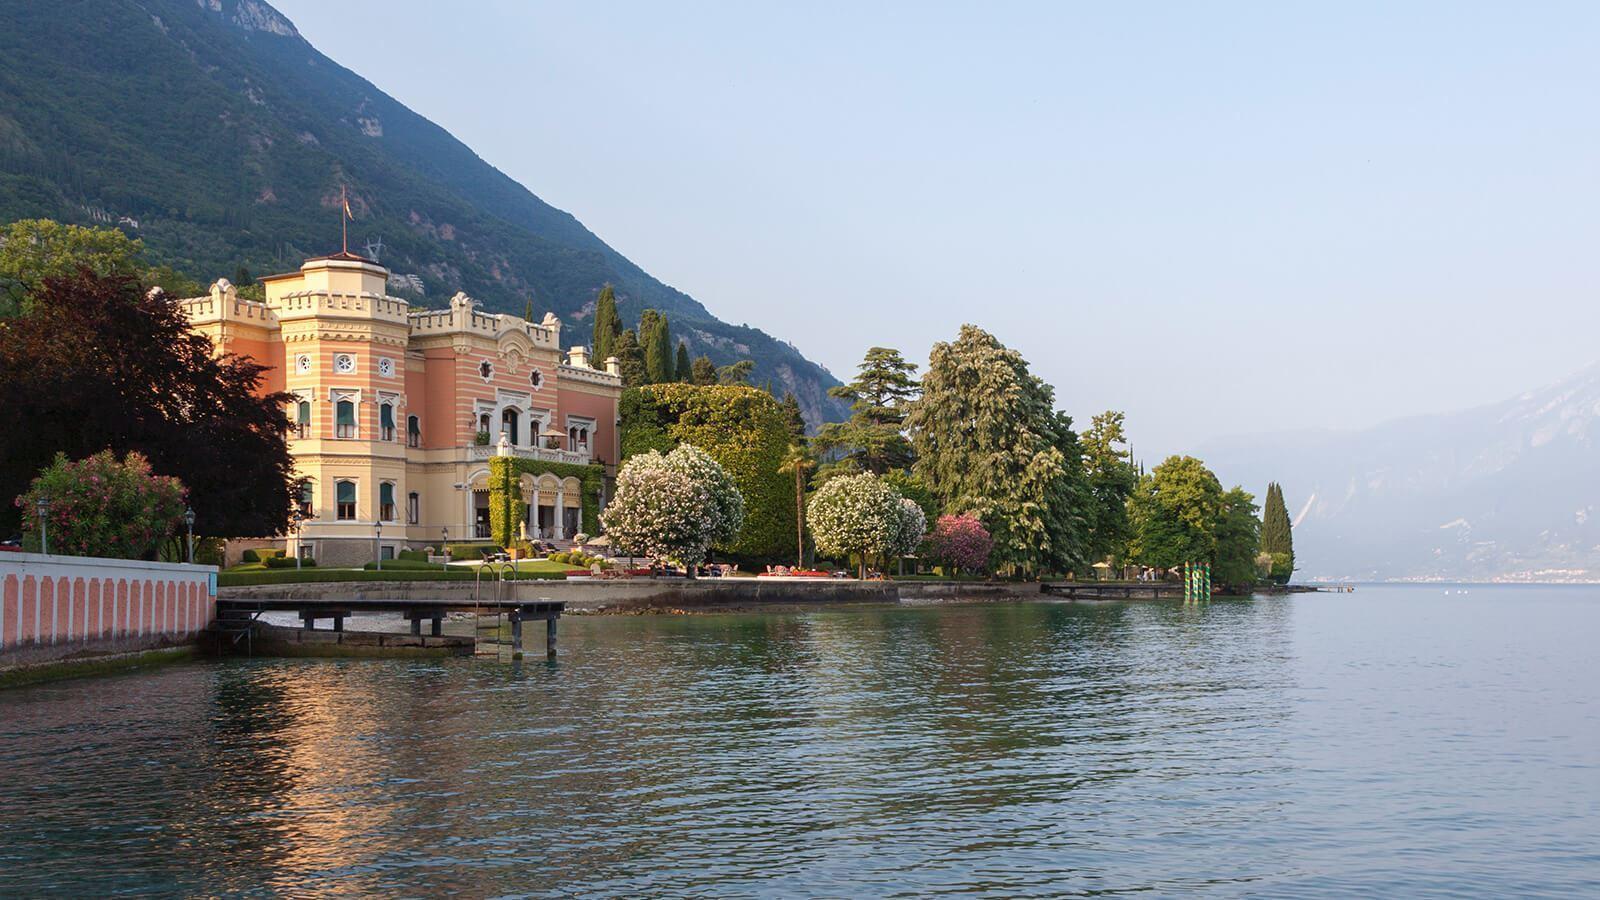 Grand Hotel a Villa Feltrinelli - The stillness of the lake of Garda